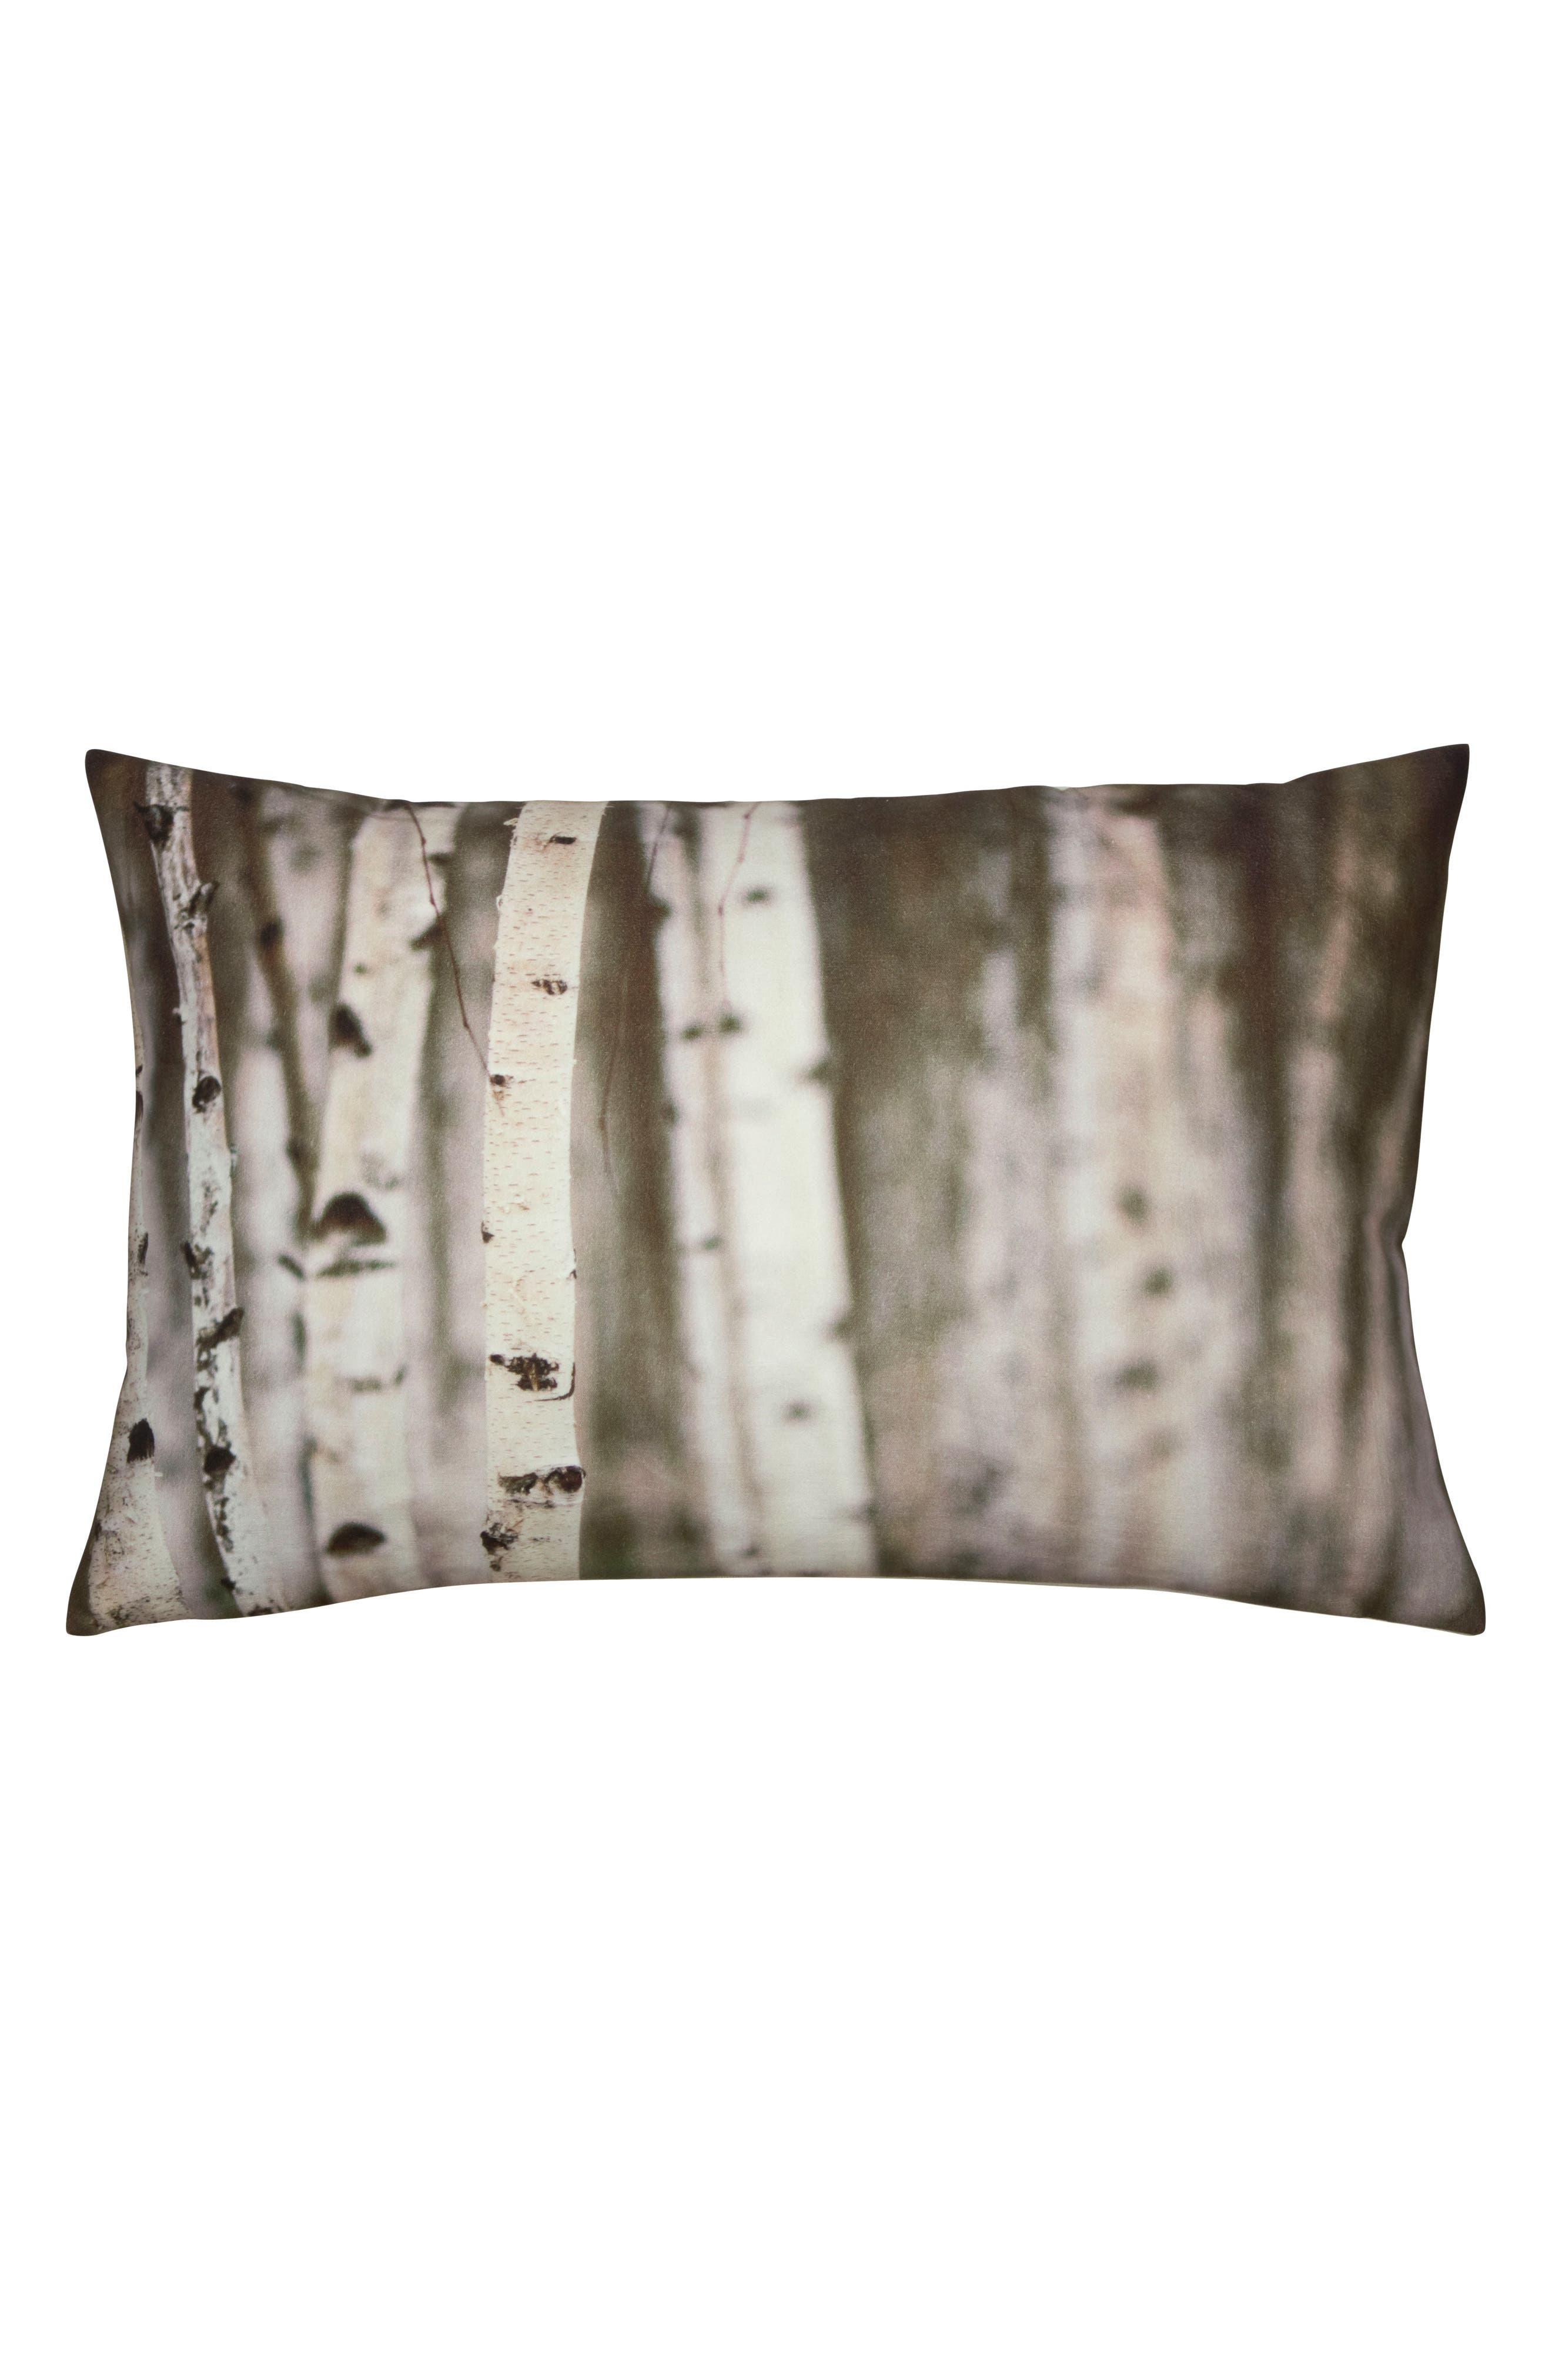 Birch Accent Pillow,                             Main thumbnail 1, color,                             200